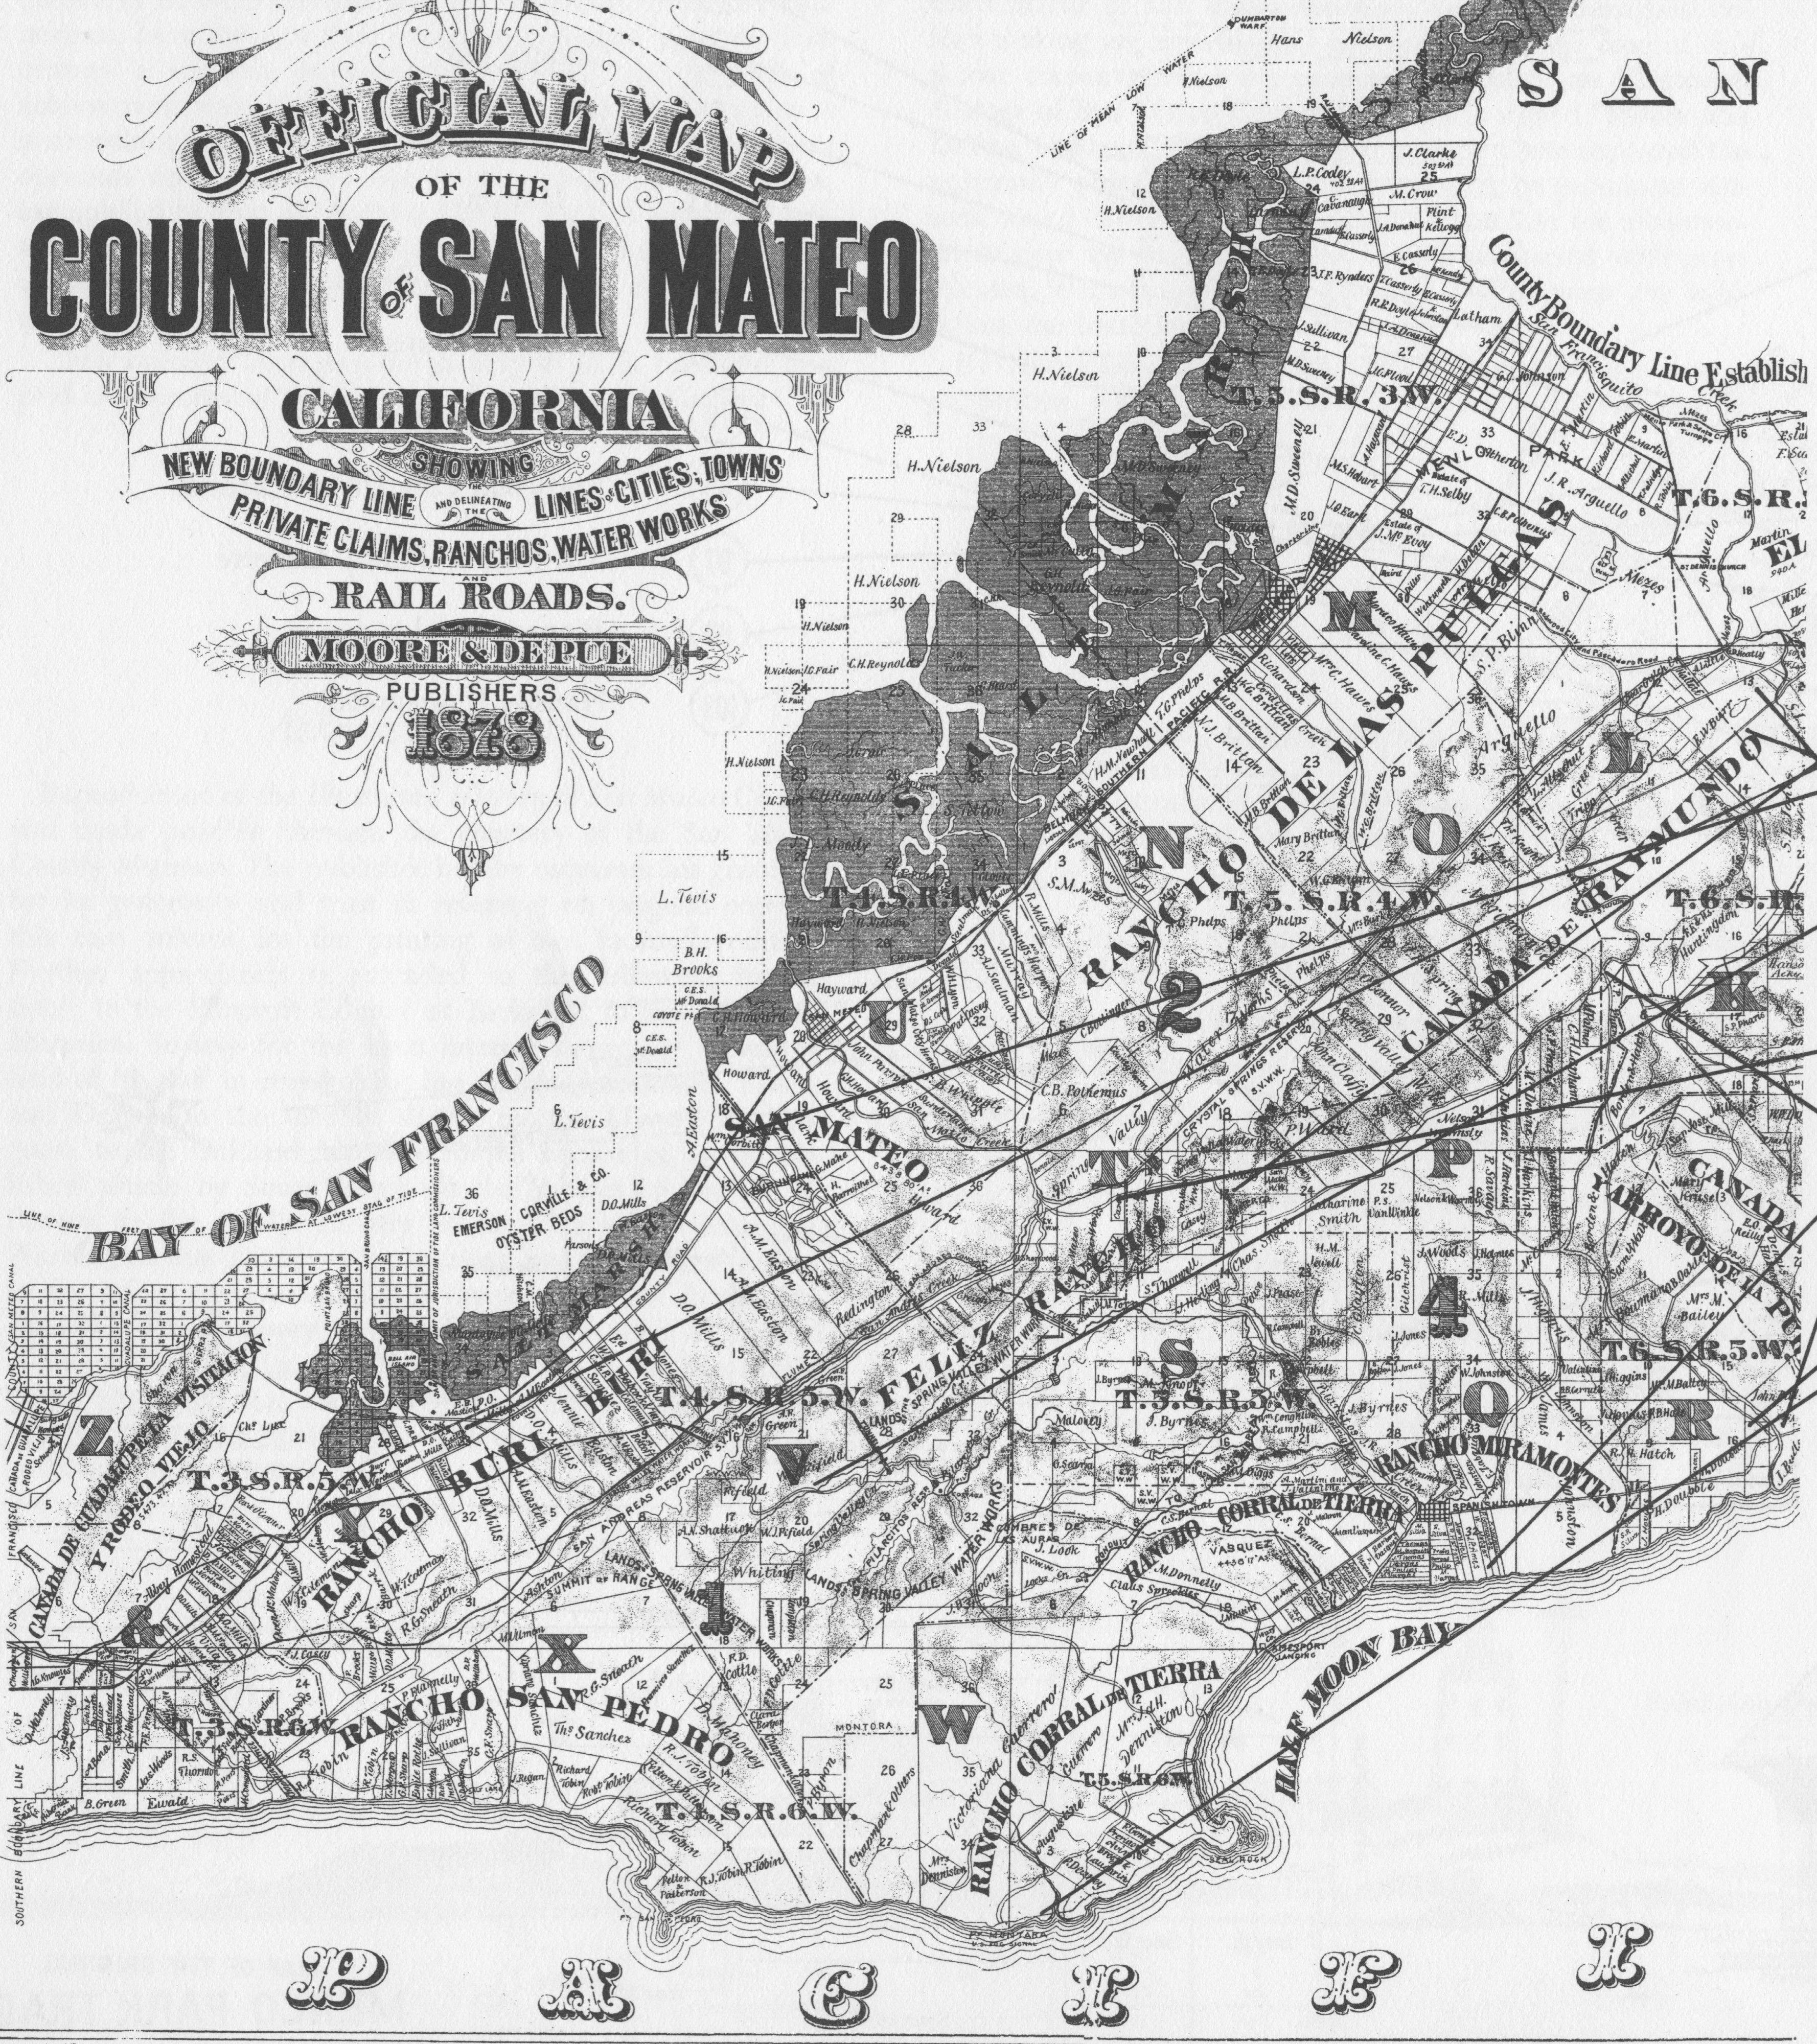 File:San Mateo County Map 1878.jpg - Wikimedia Commons on mt. san antonio map, la costa valley map, san fran map, rodriguez, rizal, fortuna ca street map, tanay, rizal, contra costa county map, santa cruz ca area map, san buenaventura map, california map, taytay, rizal, imus, cavite, alameda island map, san tomas map, san pablo map, tanza, cavite, san pedro ca map, santa clara map, carmel drive pacifica ca map, lucena city, bay area map, bacoor, cavite, cardona, rizal, san miguel map, san lorenzo map, baras, rizal, redwood city map, cainta, rizal, morong, rizal, jala-jala, rizal, san martin map, antipolo city,